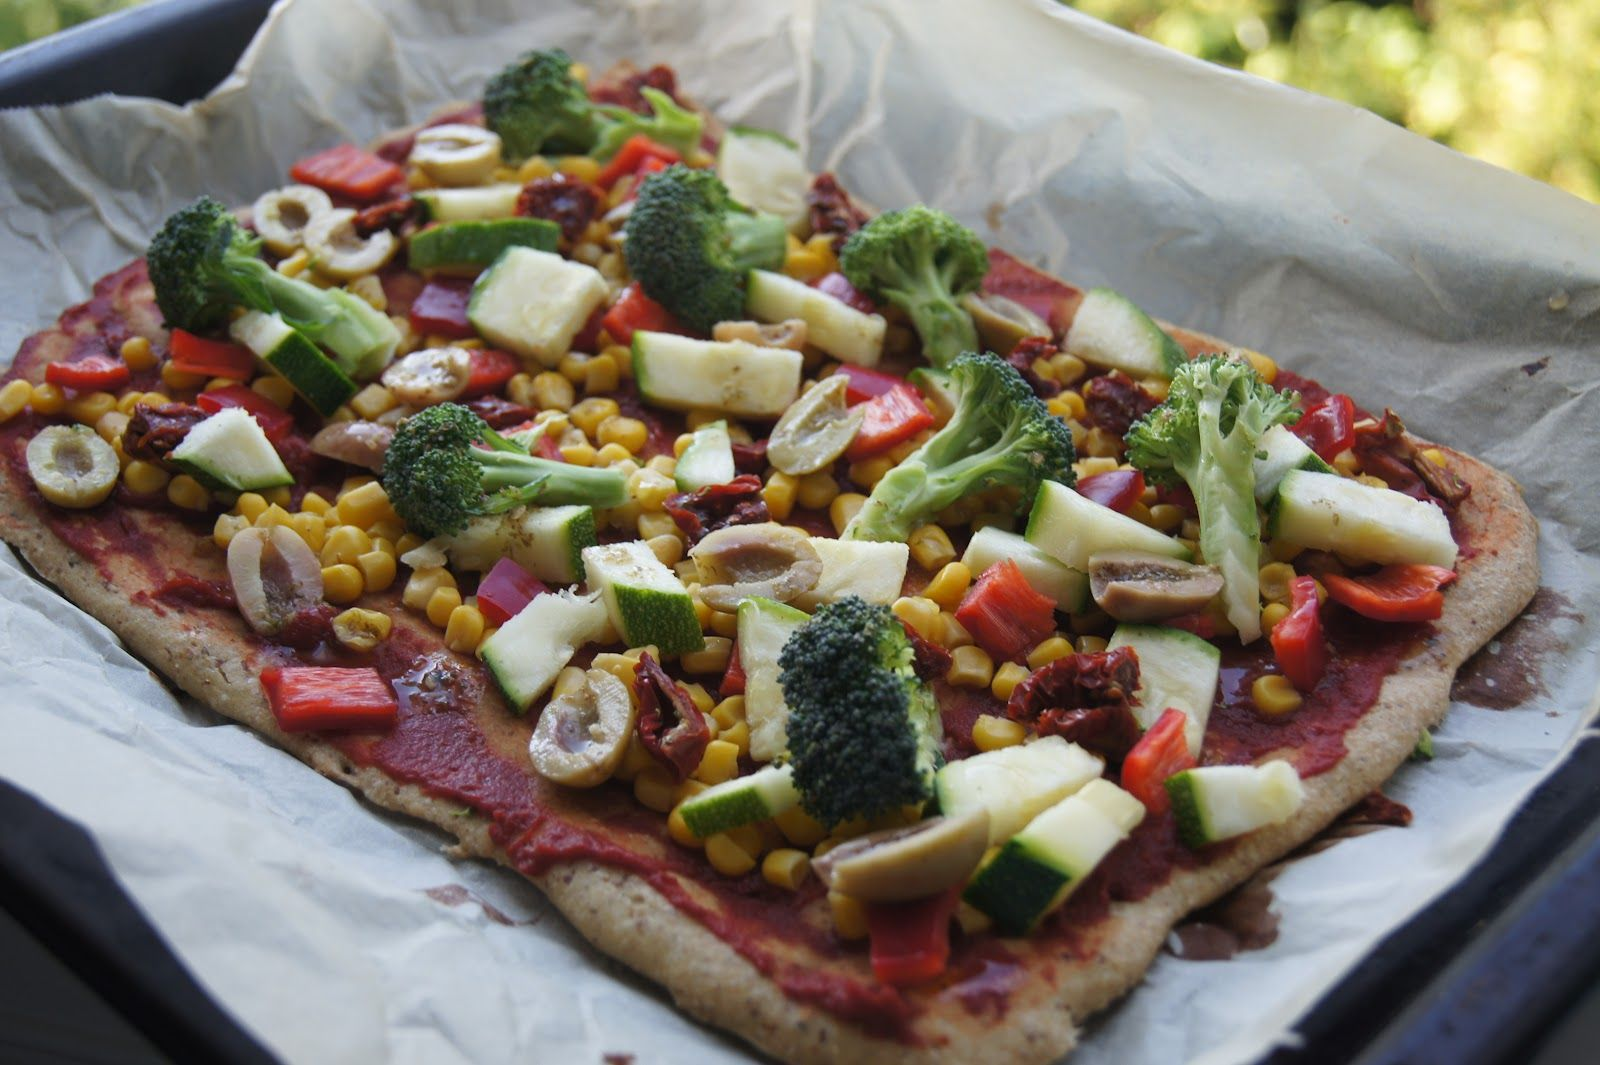 Basic glutenfree vegan pizza crust recipe with images